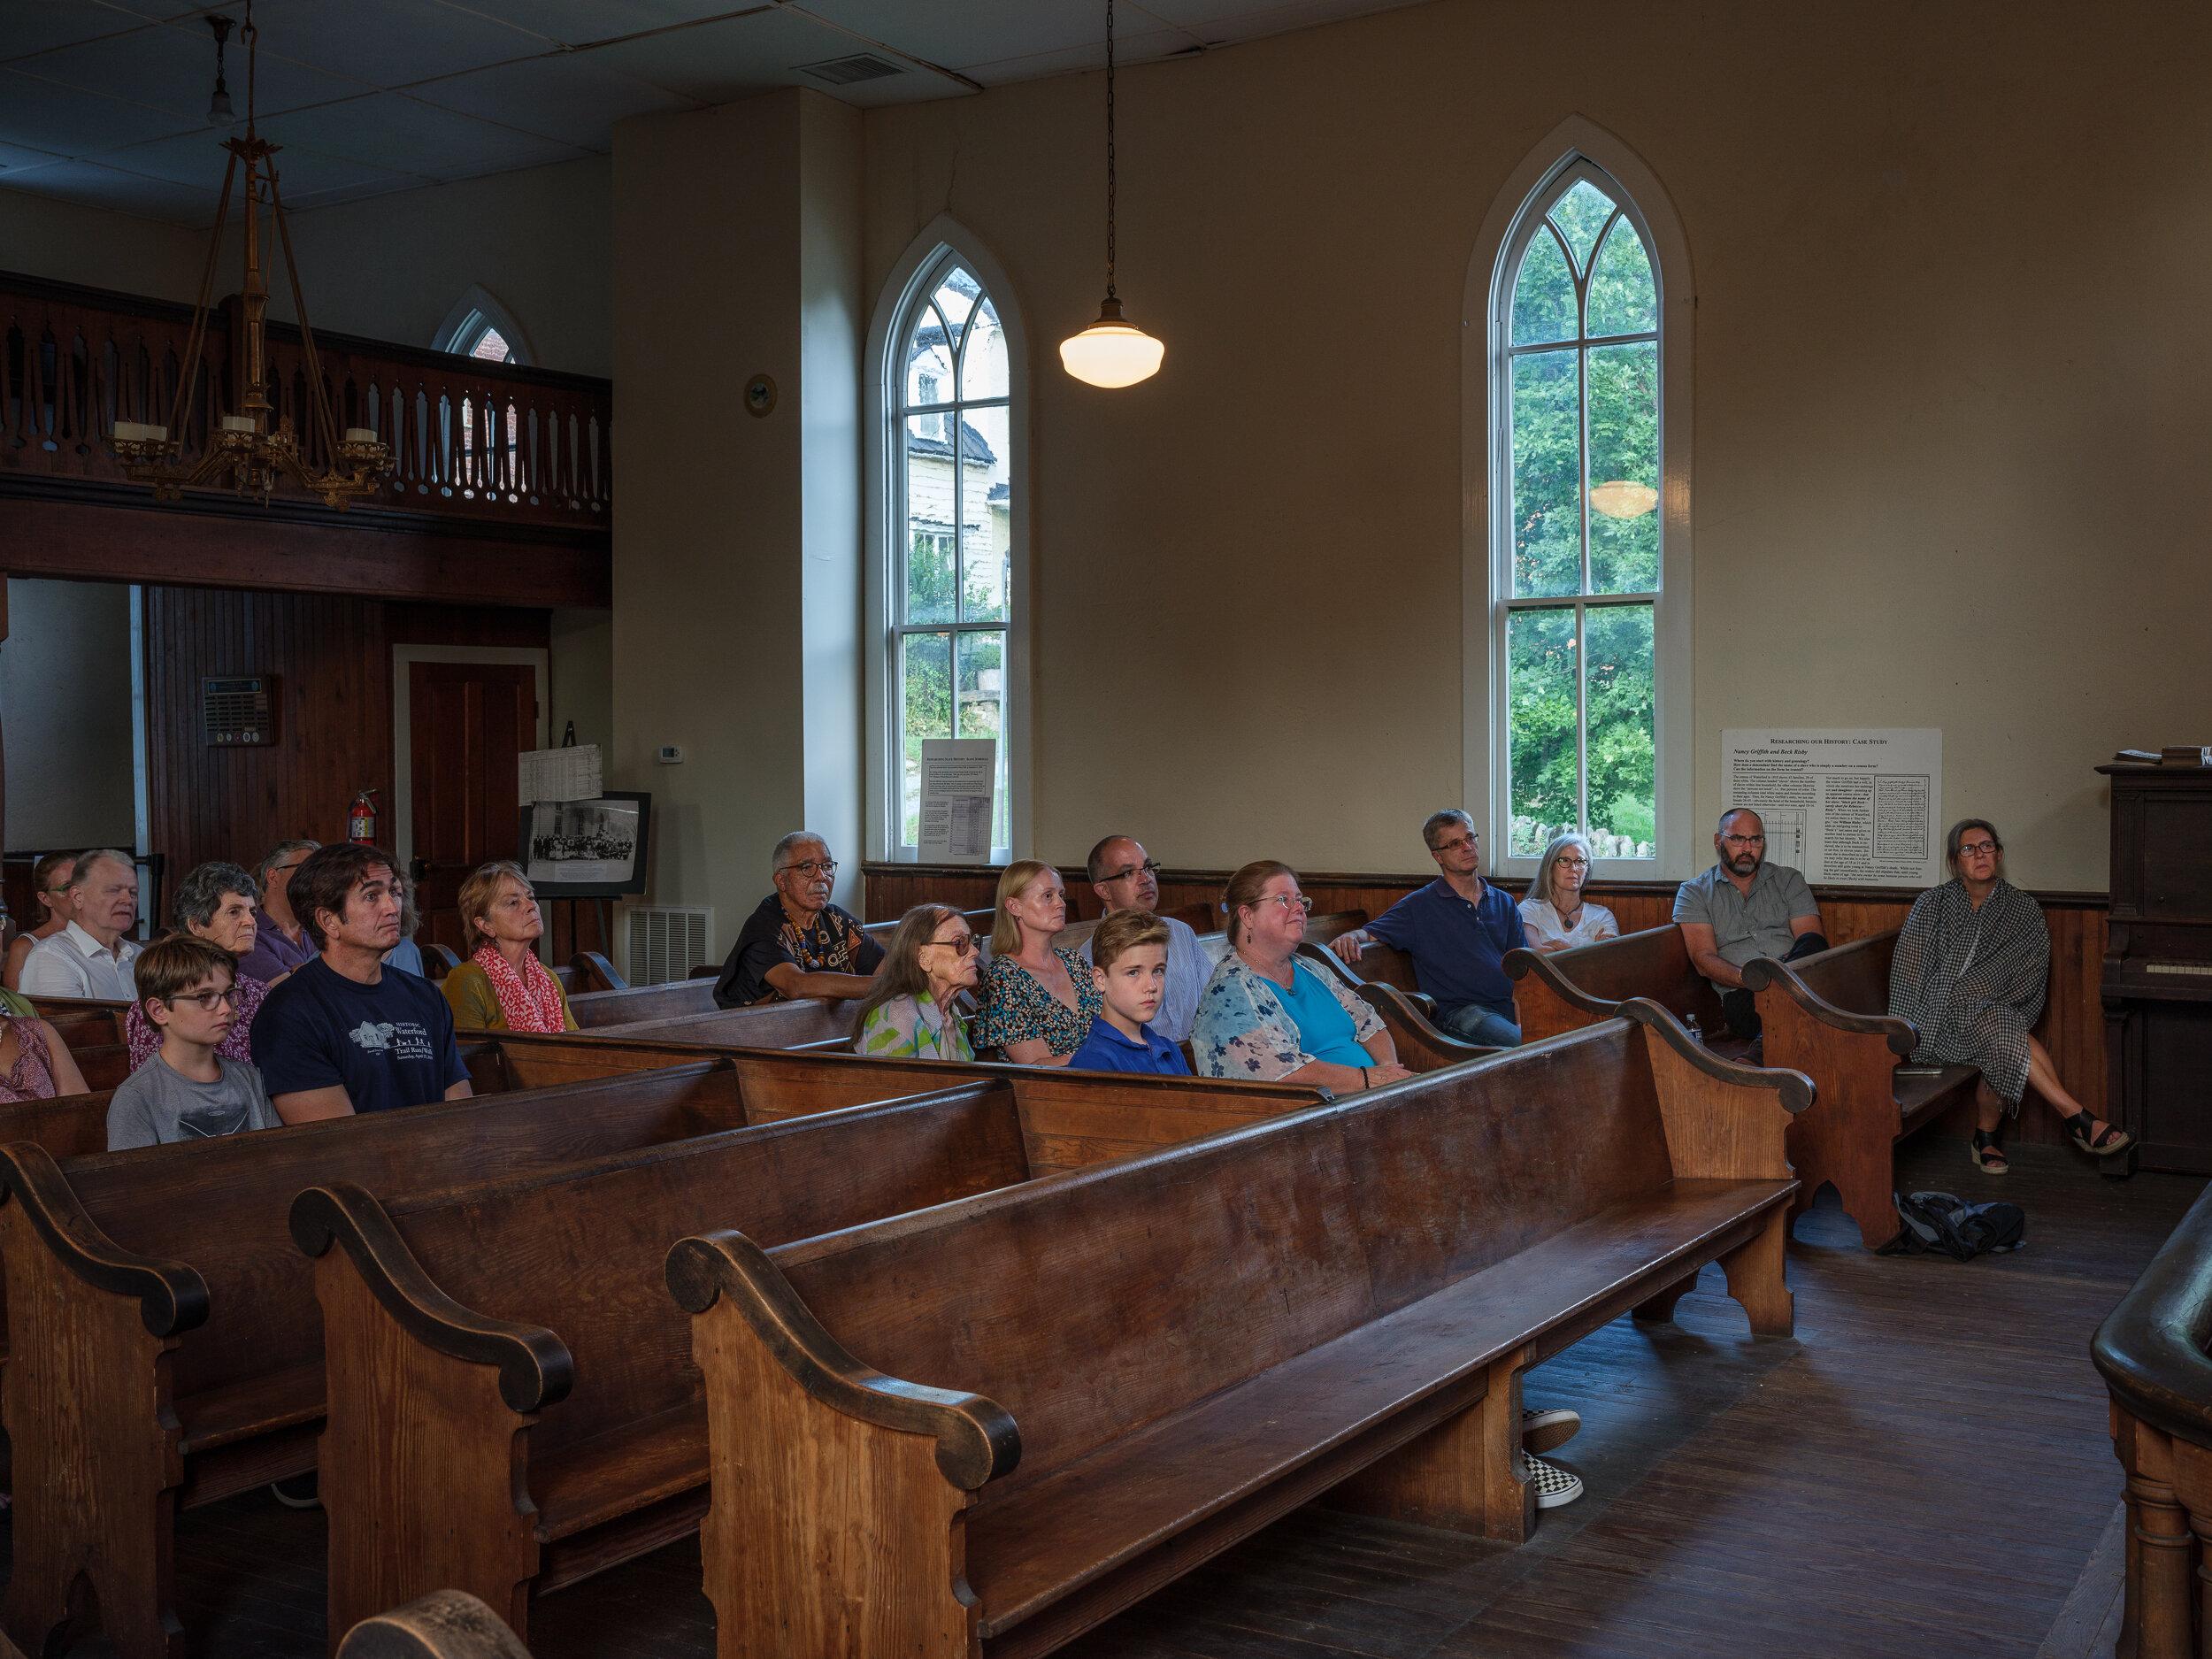 Congregation, Waterford, Virginia, 2019